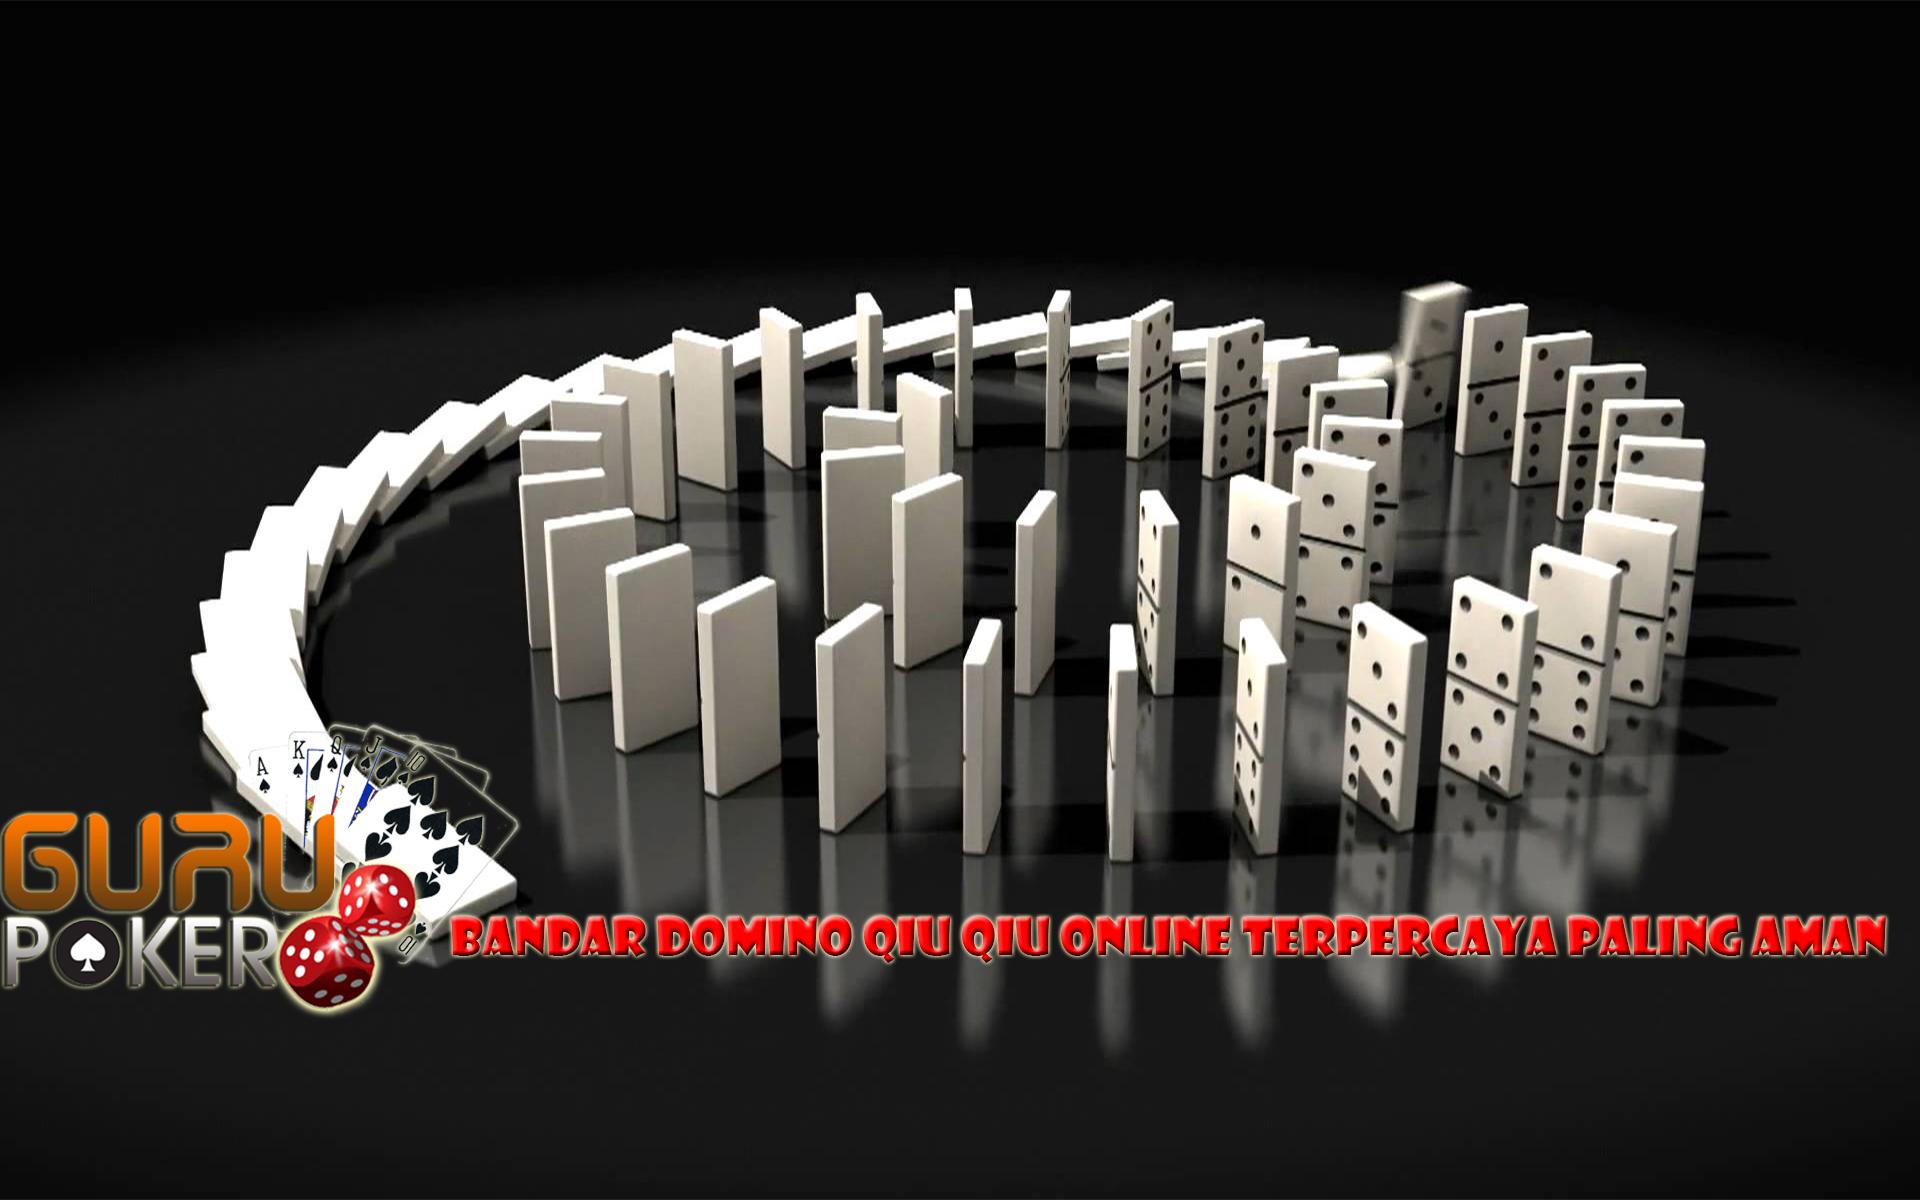 Bandar Domino qiu qiu Online Terpercaya Paling Aman